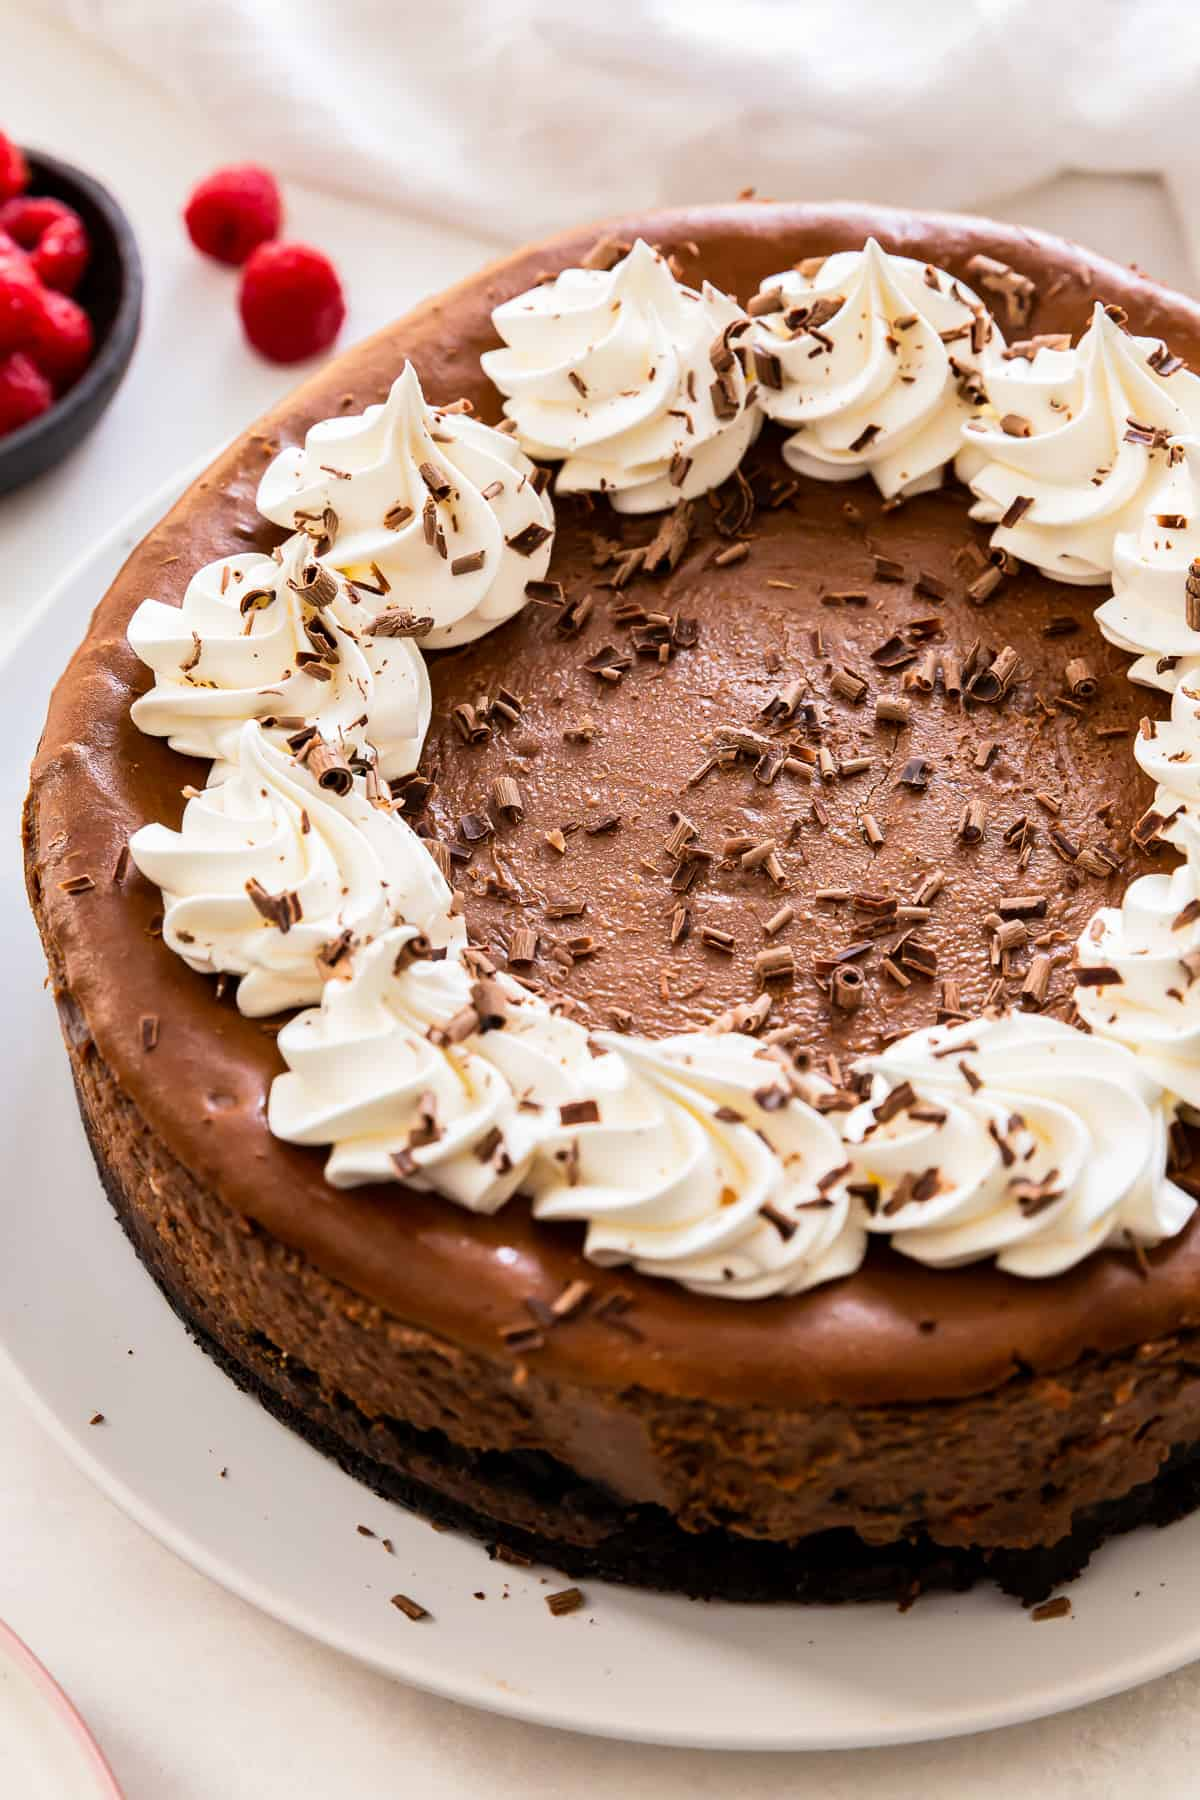 chocolate cheesecake with whipped cream